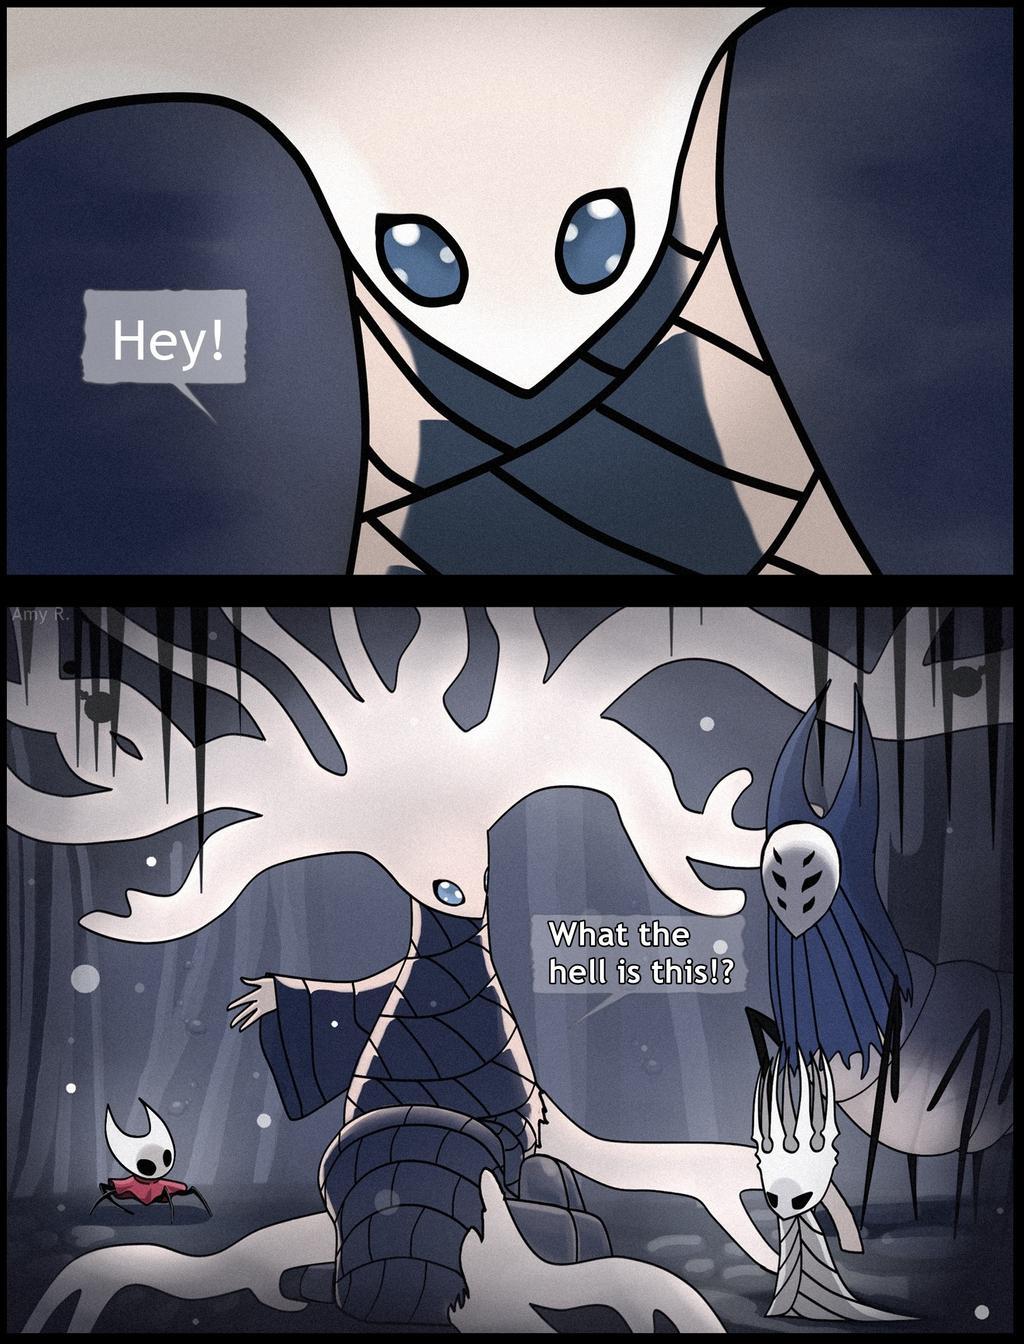 Hollow Knight (meme) by AmyWolfhardt on DeviantArt